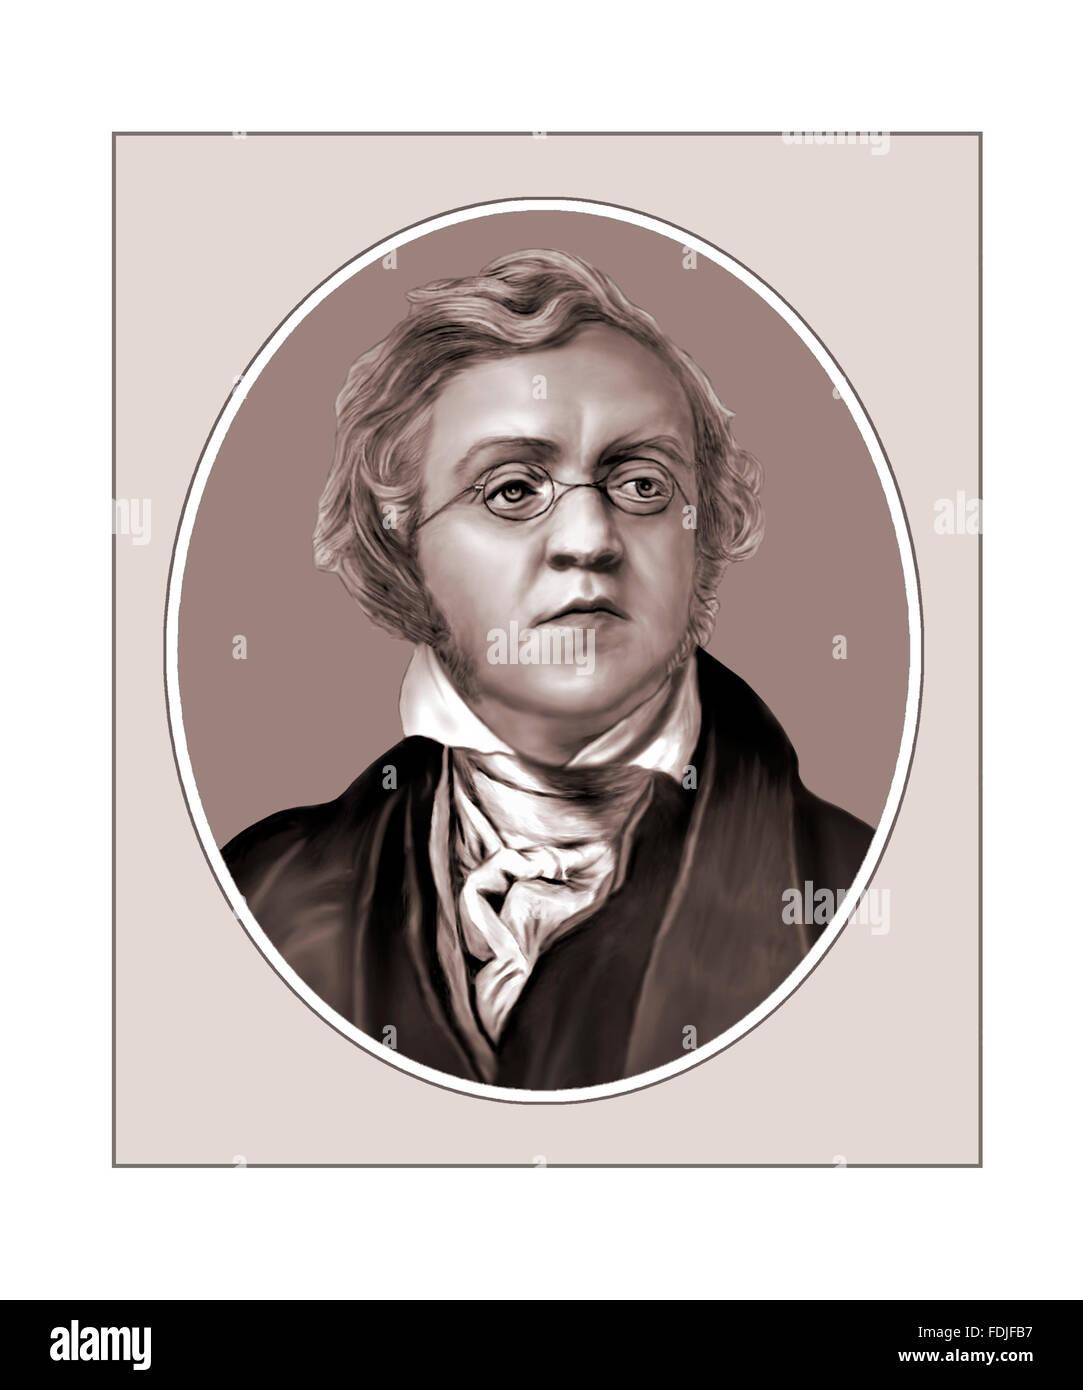 William Makepeace Thackeray, Novelist, Portrait Stock Photo